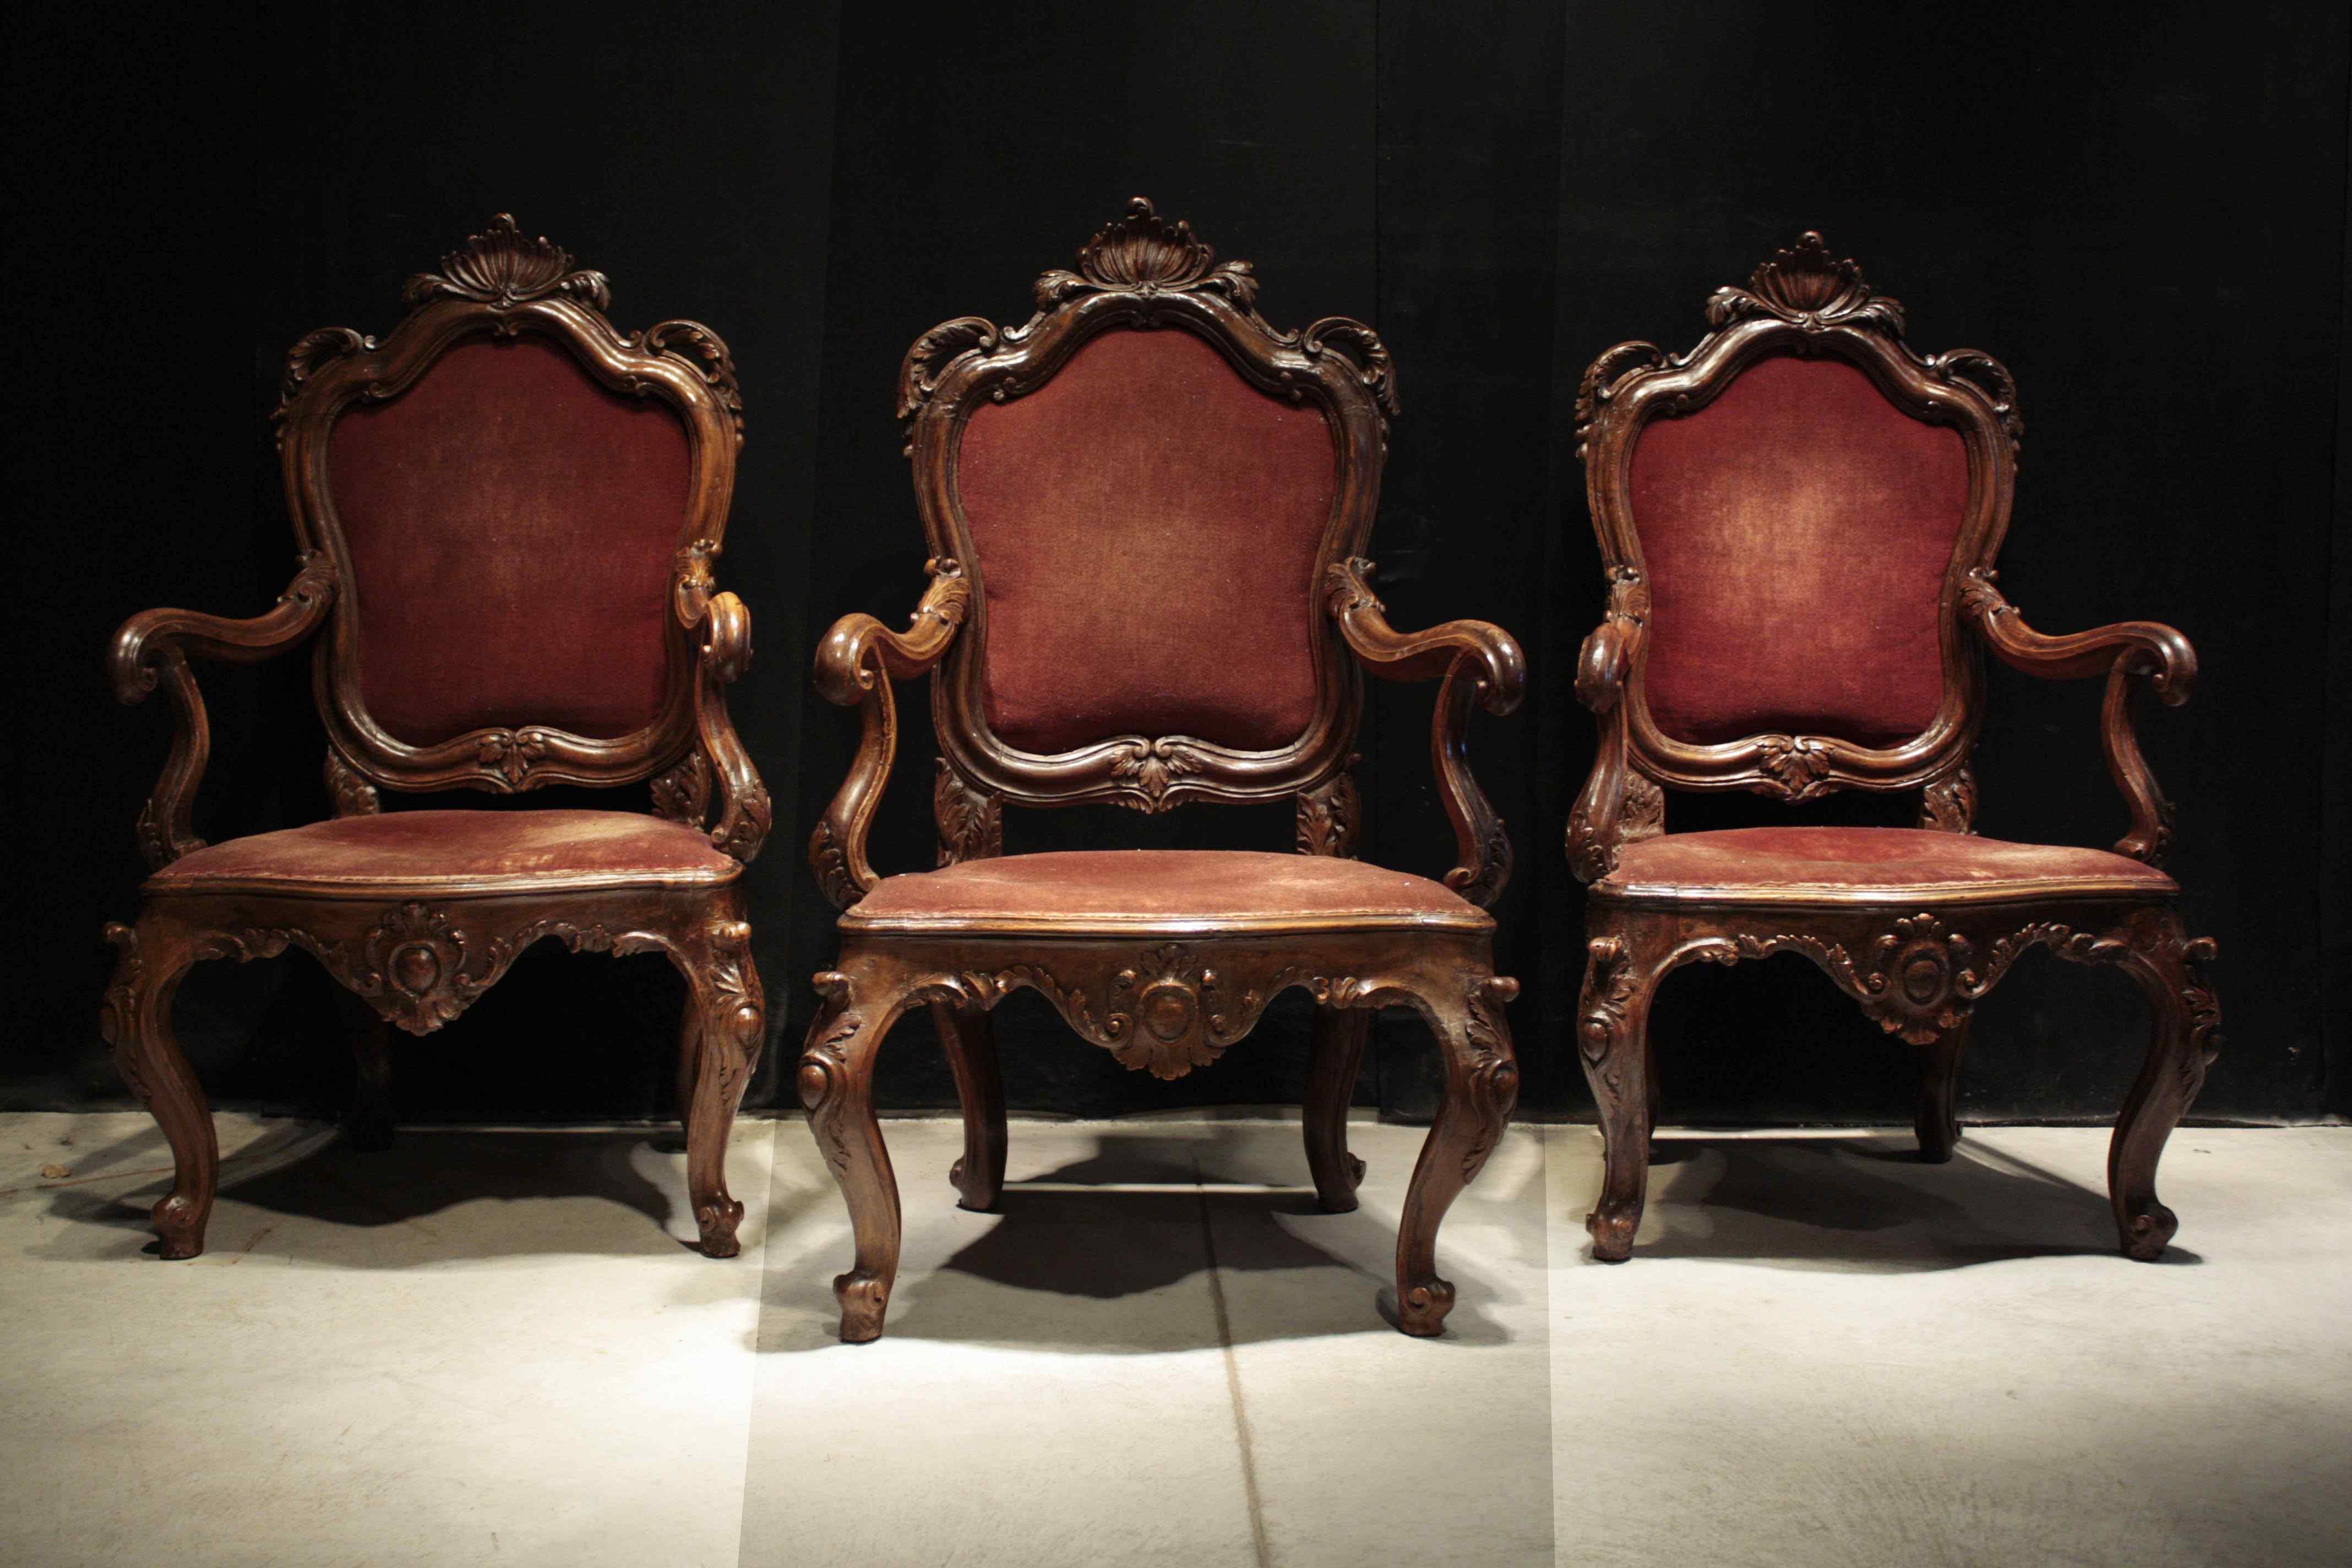 Tre poltrone veneziane Sec. XVIII